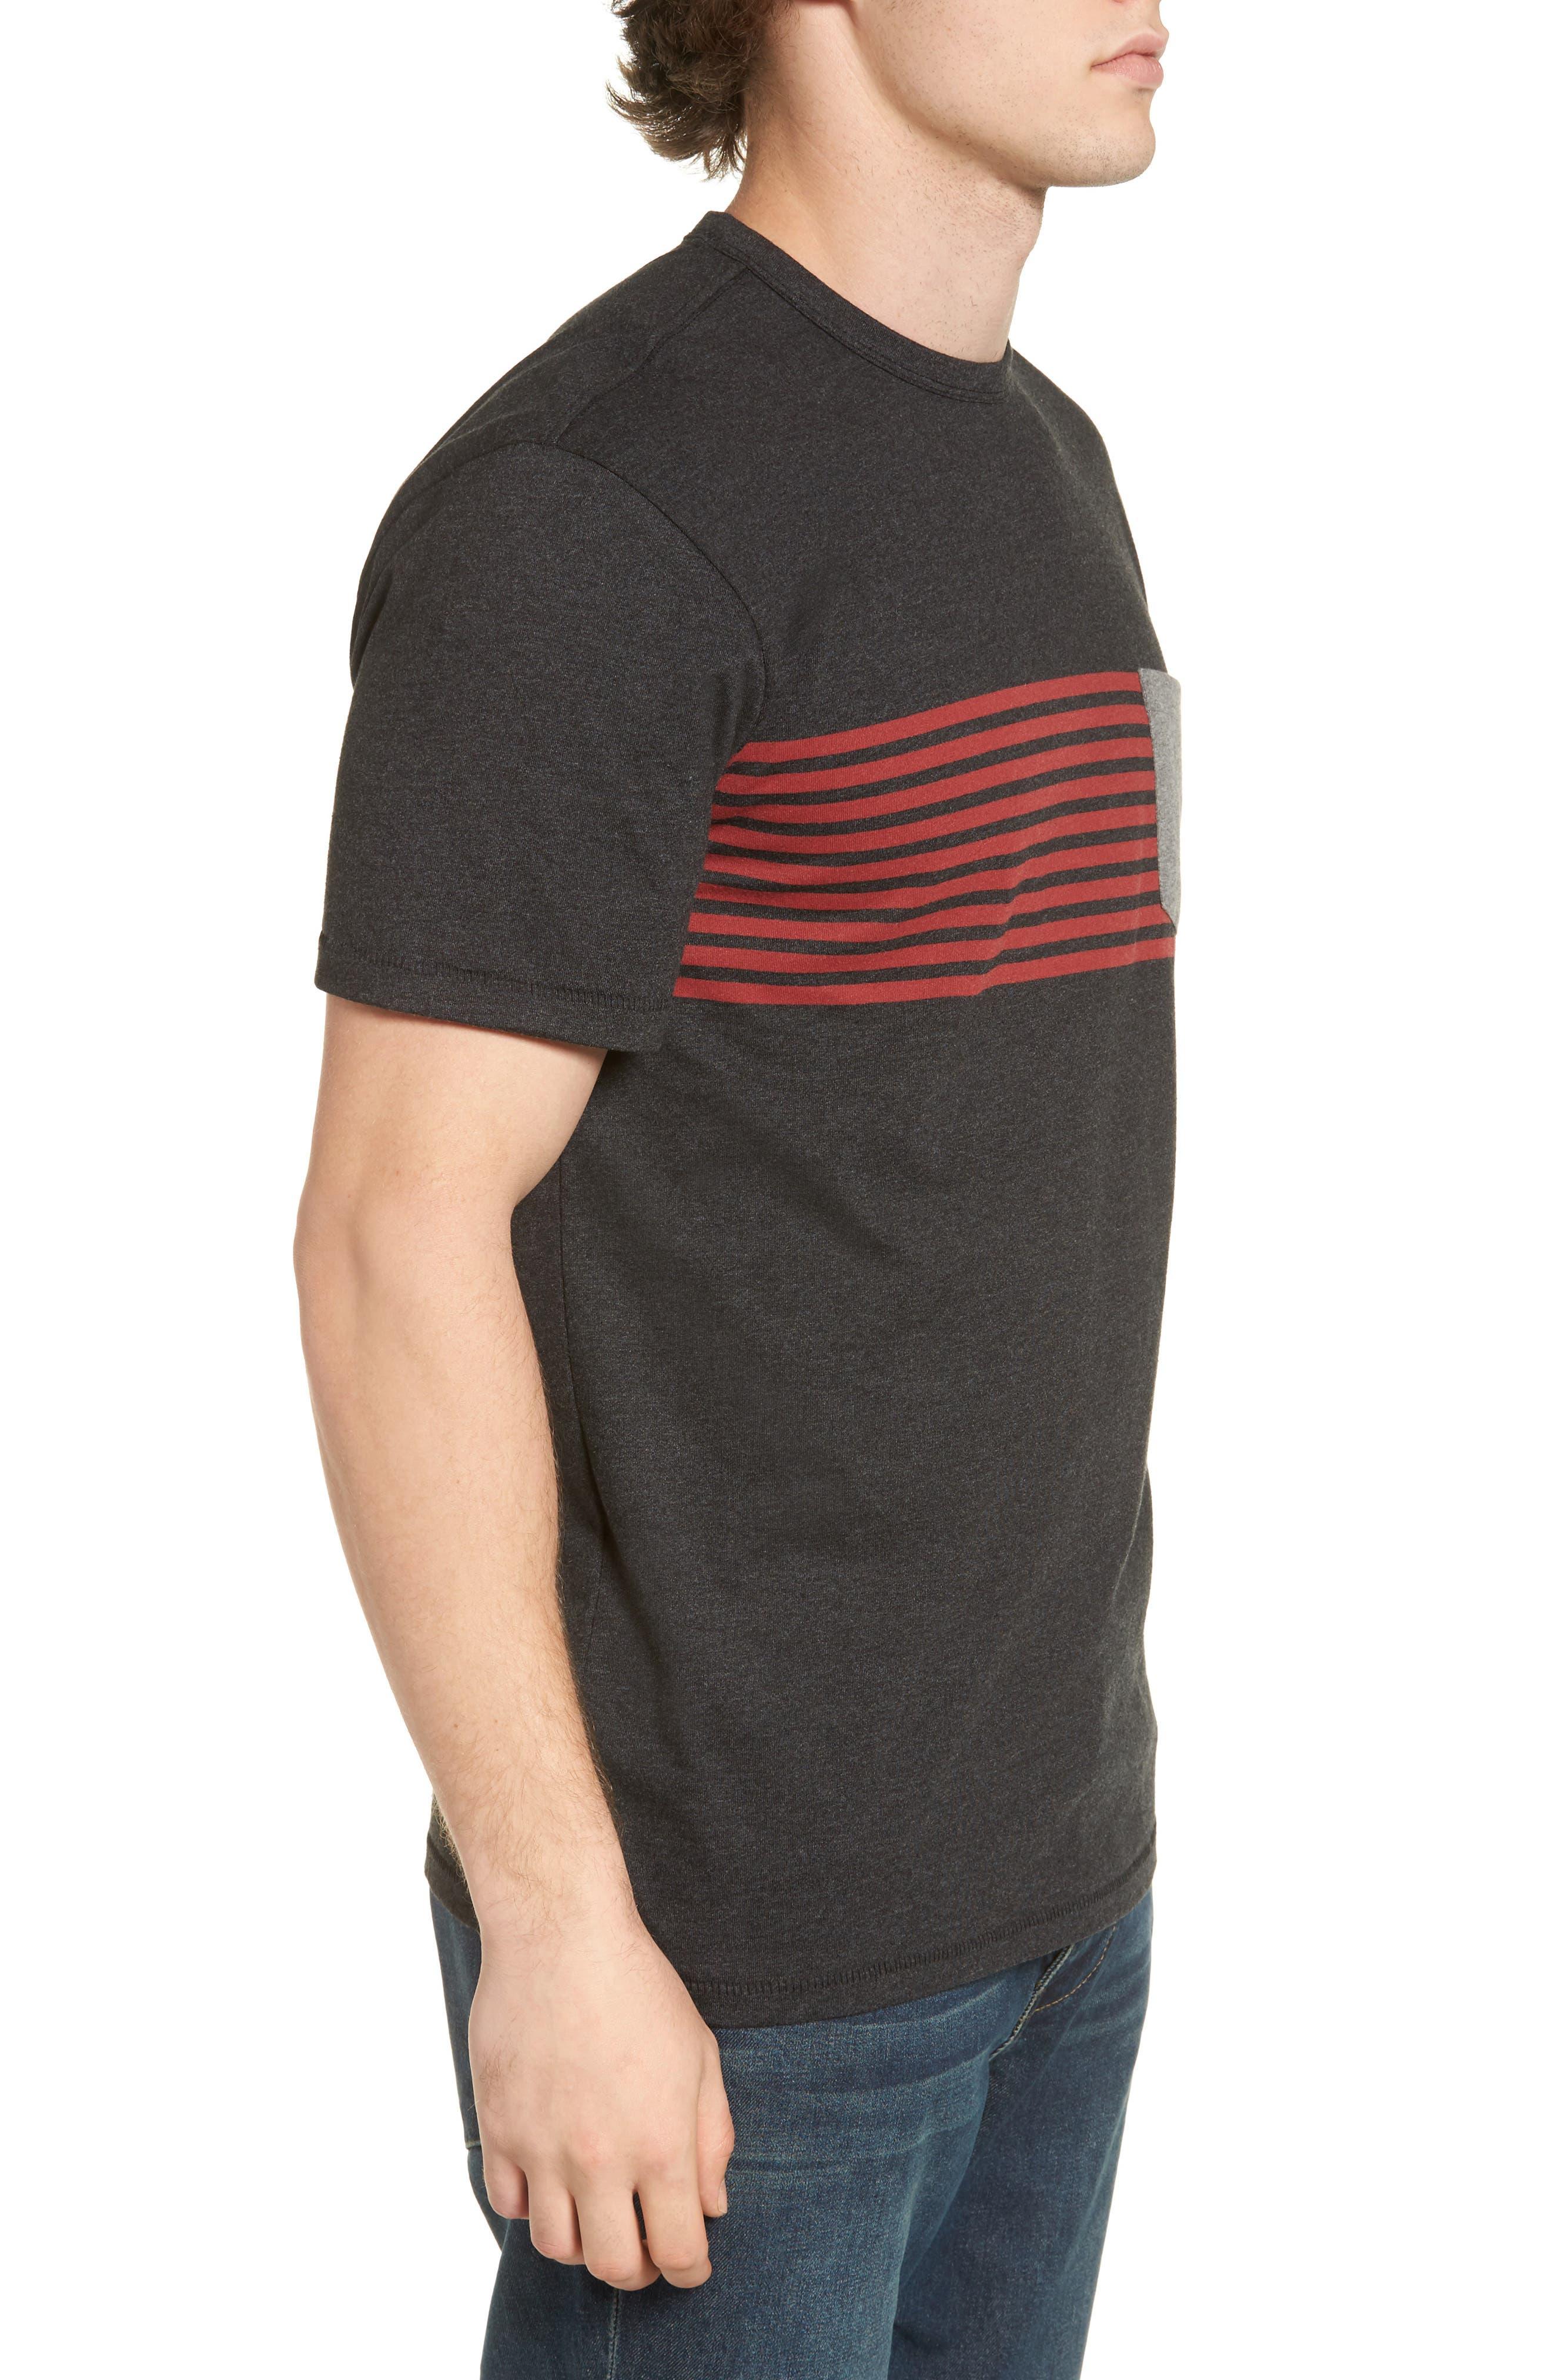 Alternate Image 3  - O'Neill Rodgers Striped Pocket T-Shirt